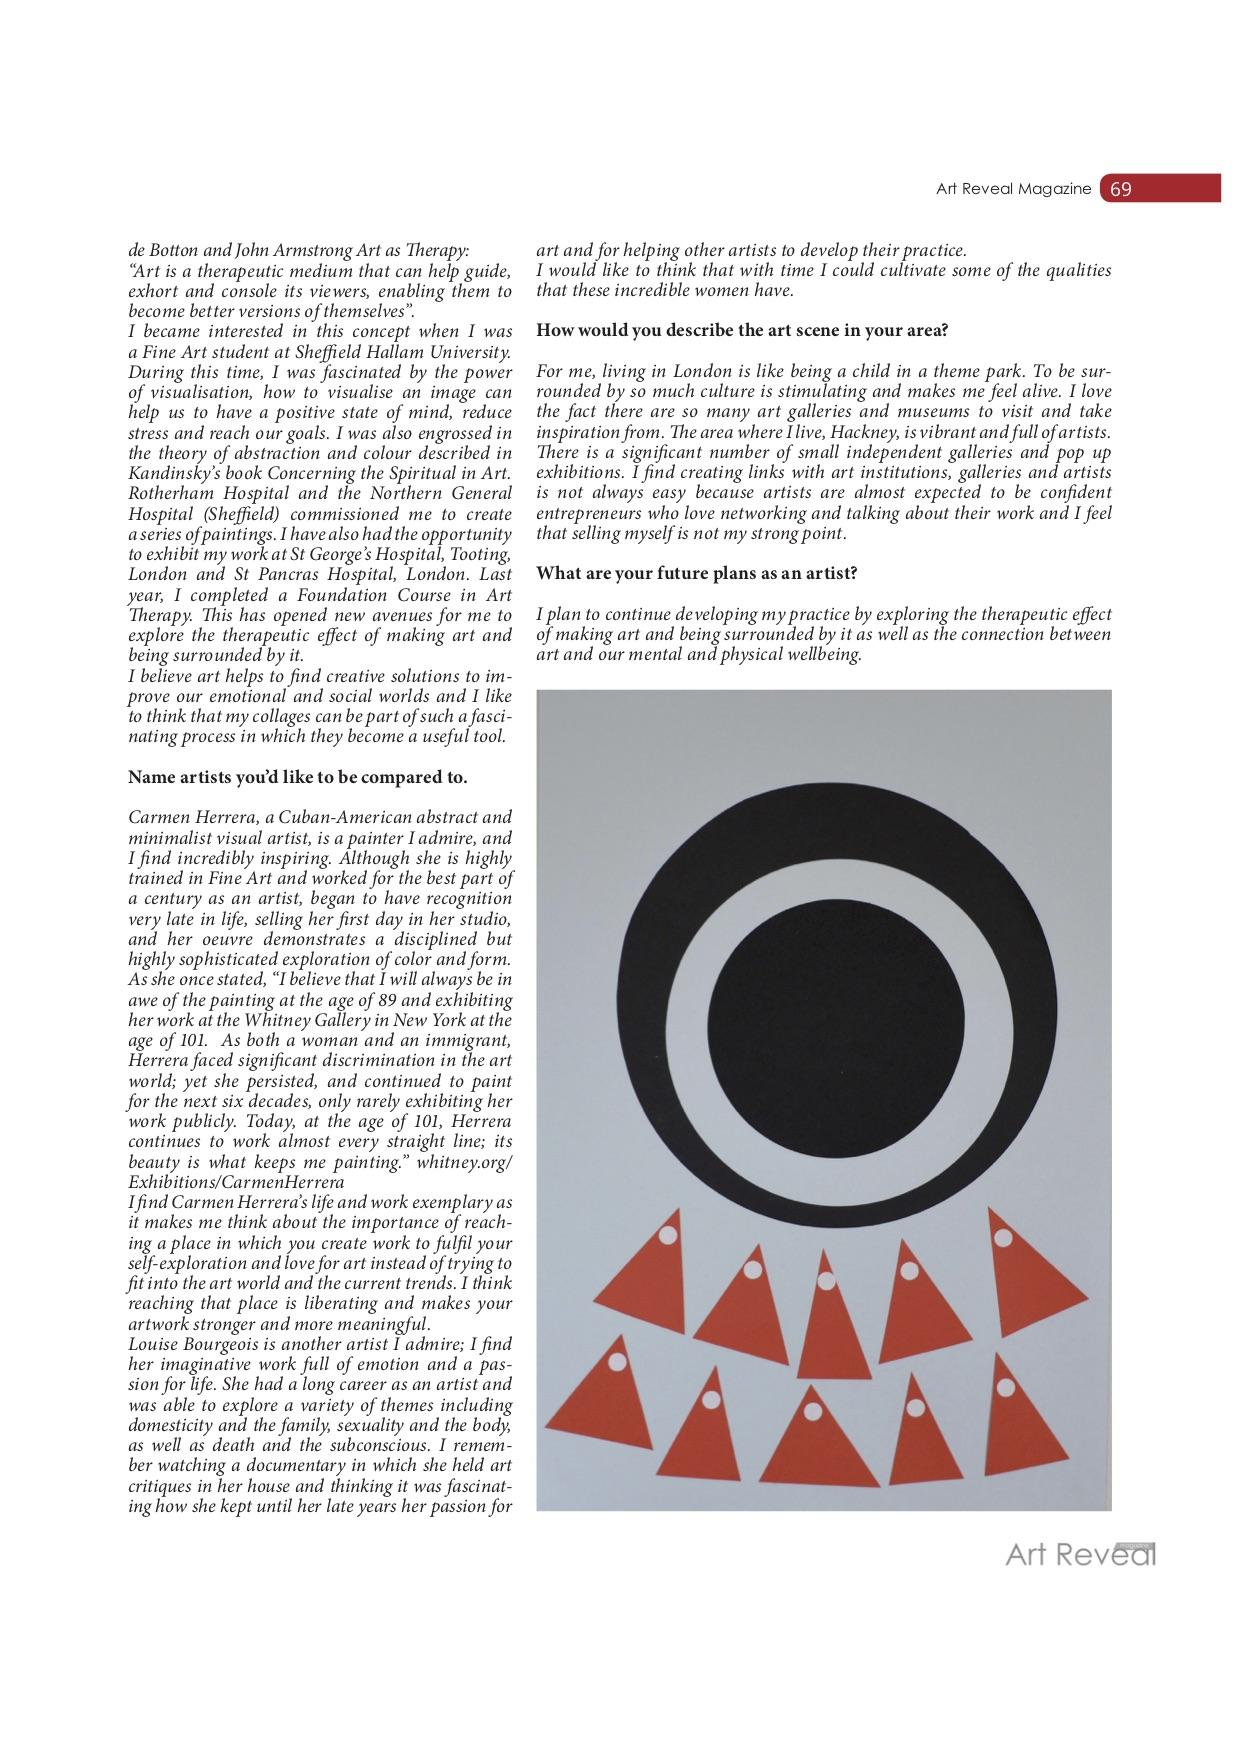 L Obon Art Reveal 3.jpg